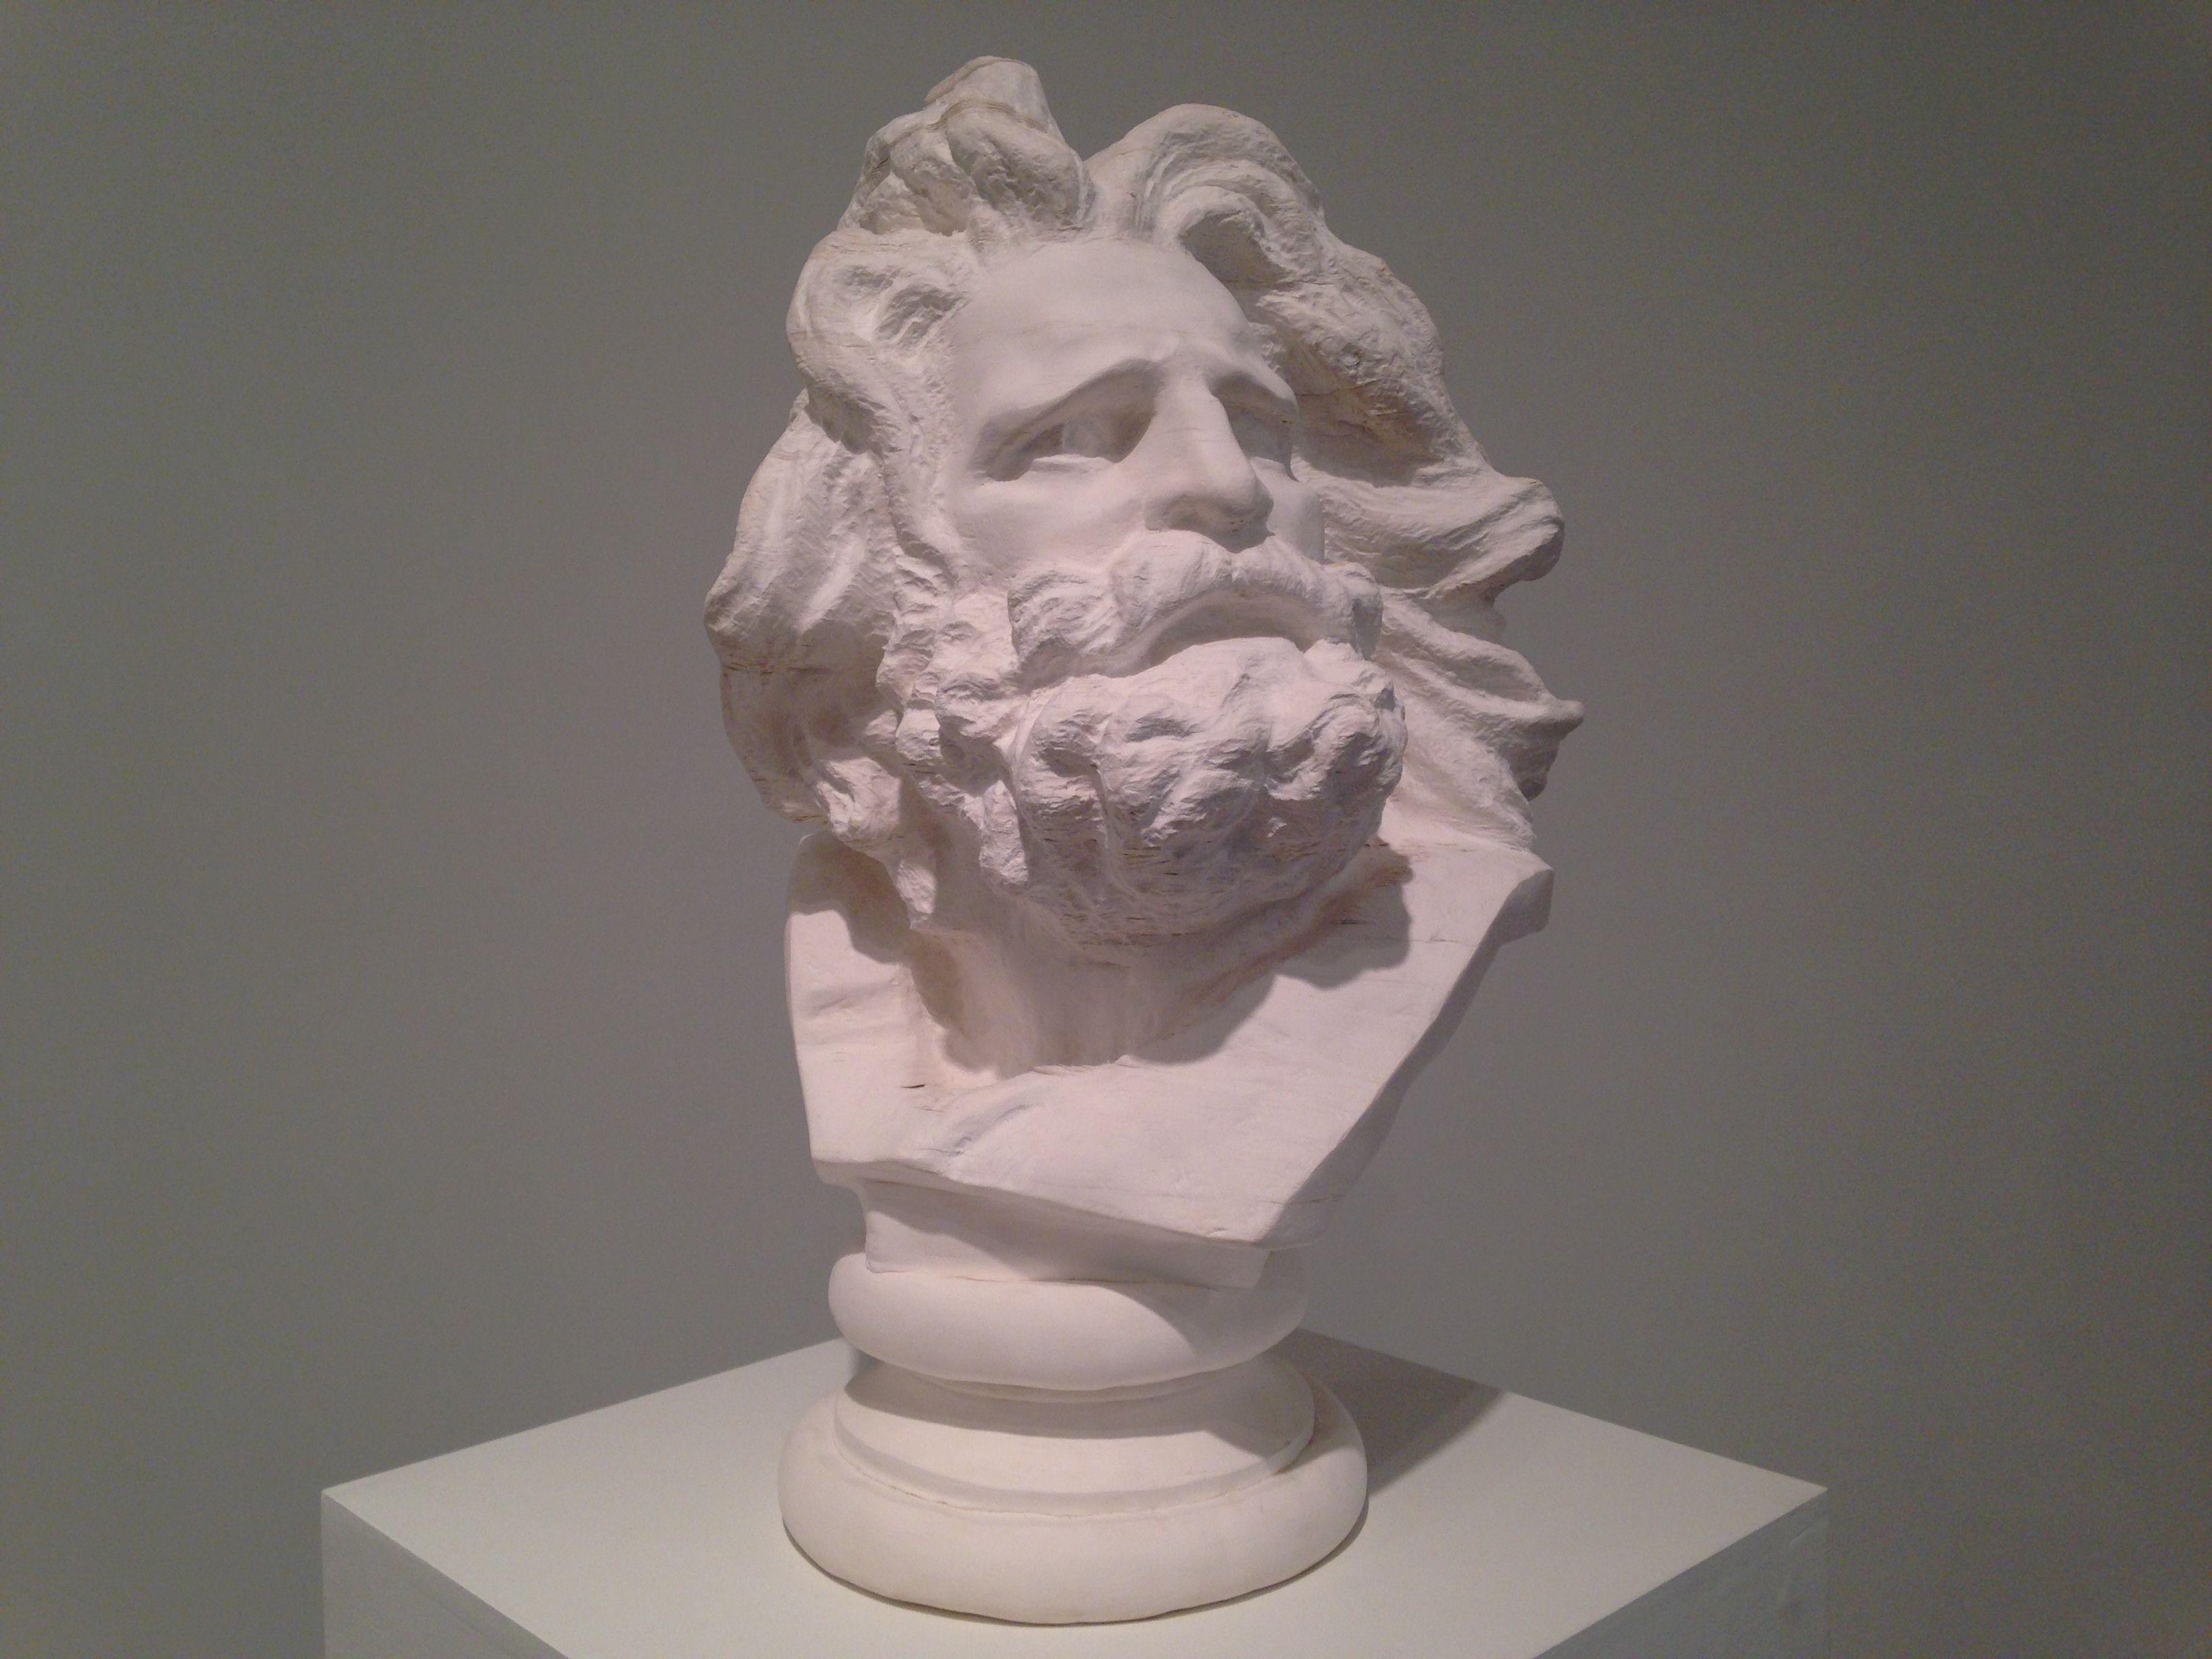 Li-Hongbo-at-Klein-Sun-Gallery-NY-89.jpeg (3264×2448)